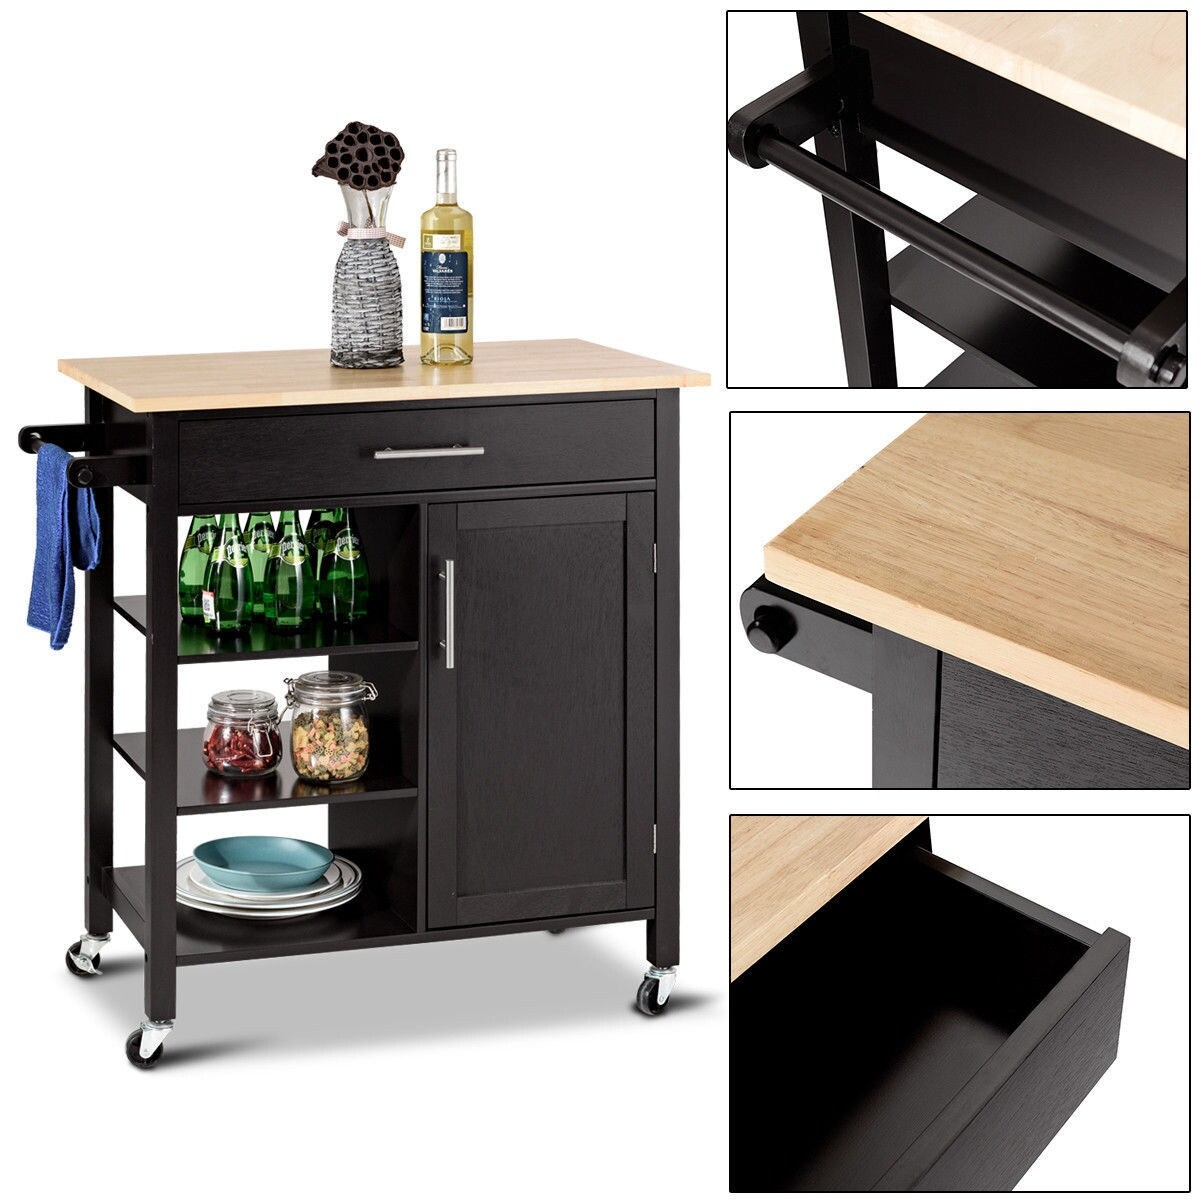 Costway 4 Tier Rolling Wood Kitchen Trolley Cart Island Storage Cabinet Shelf Drawer As Pic